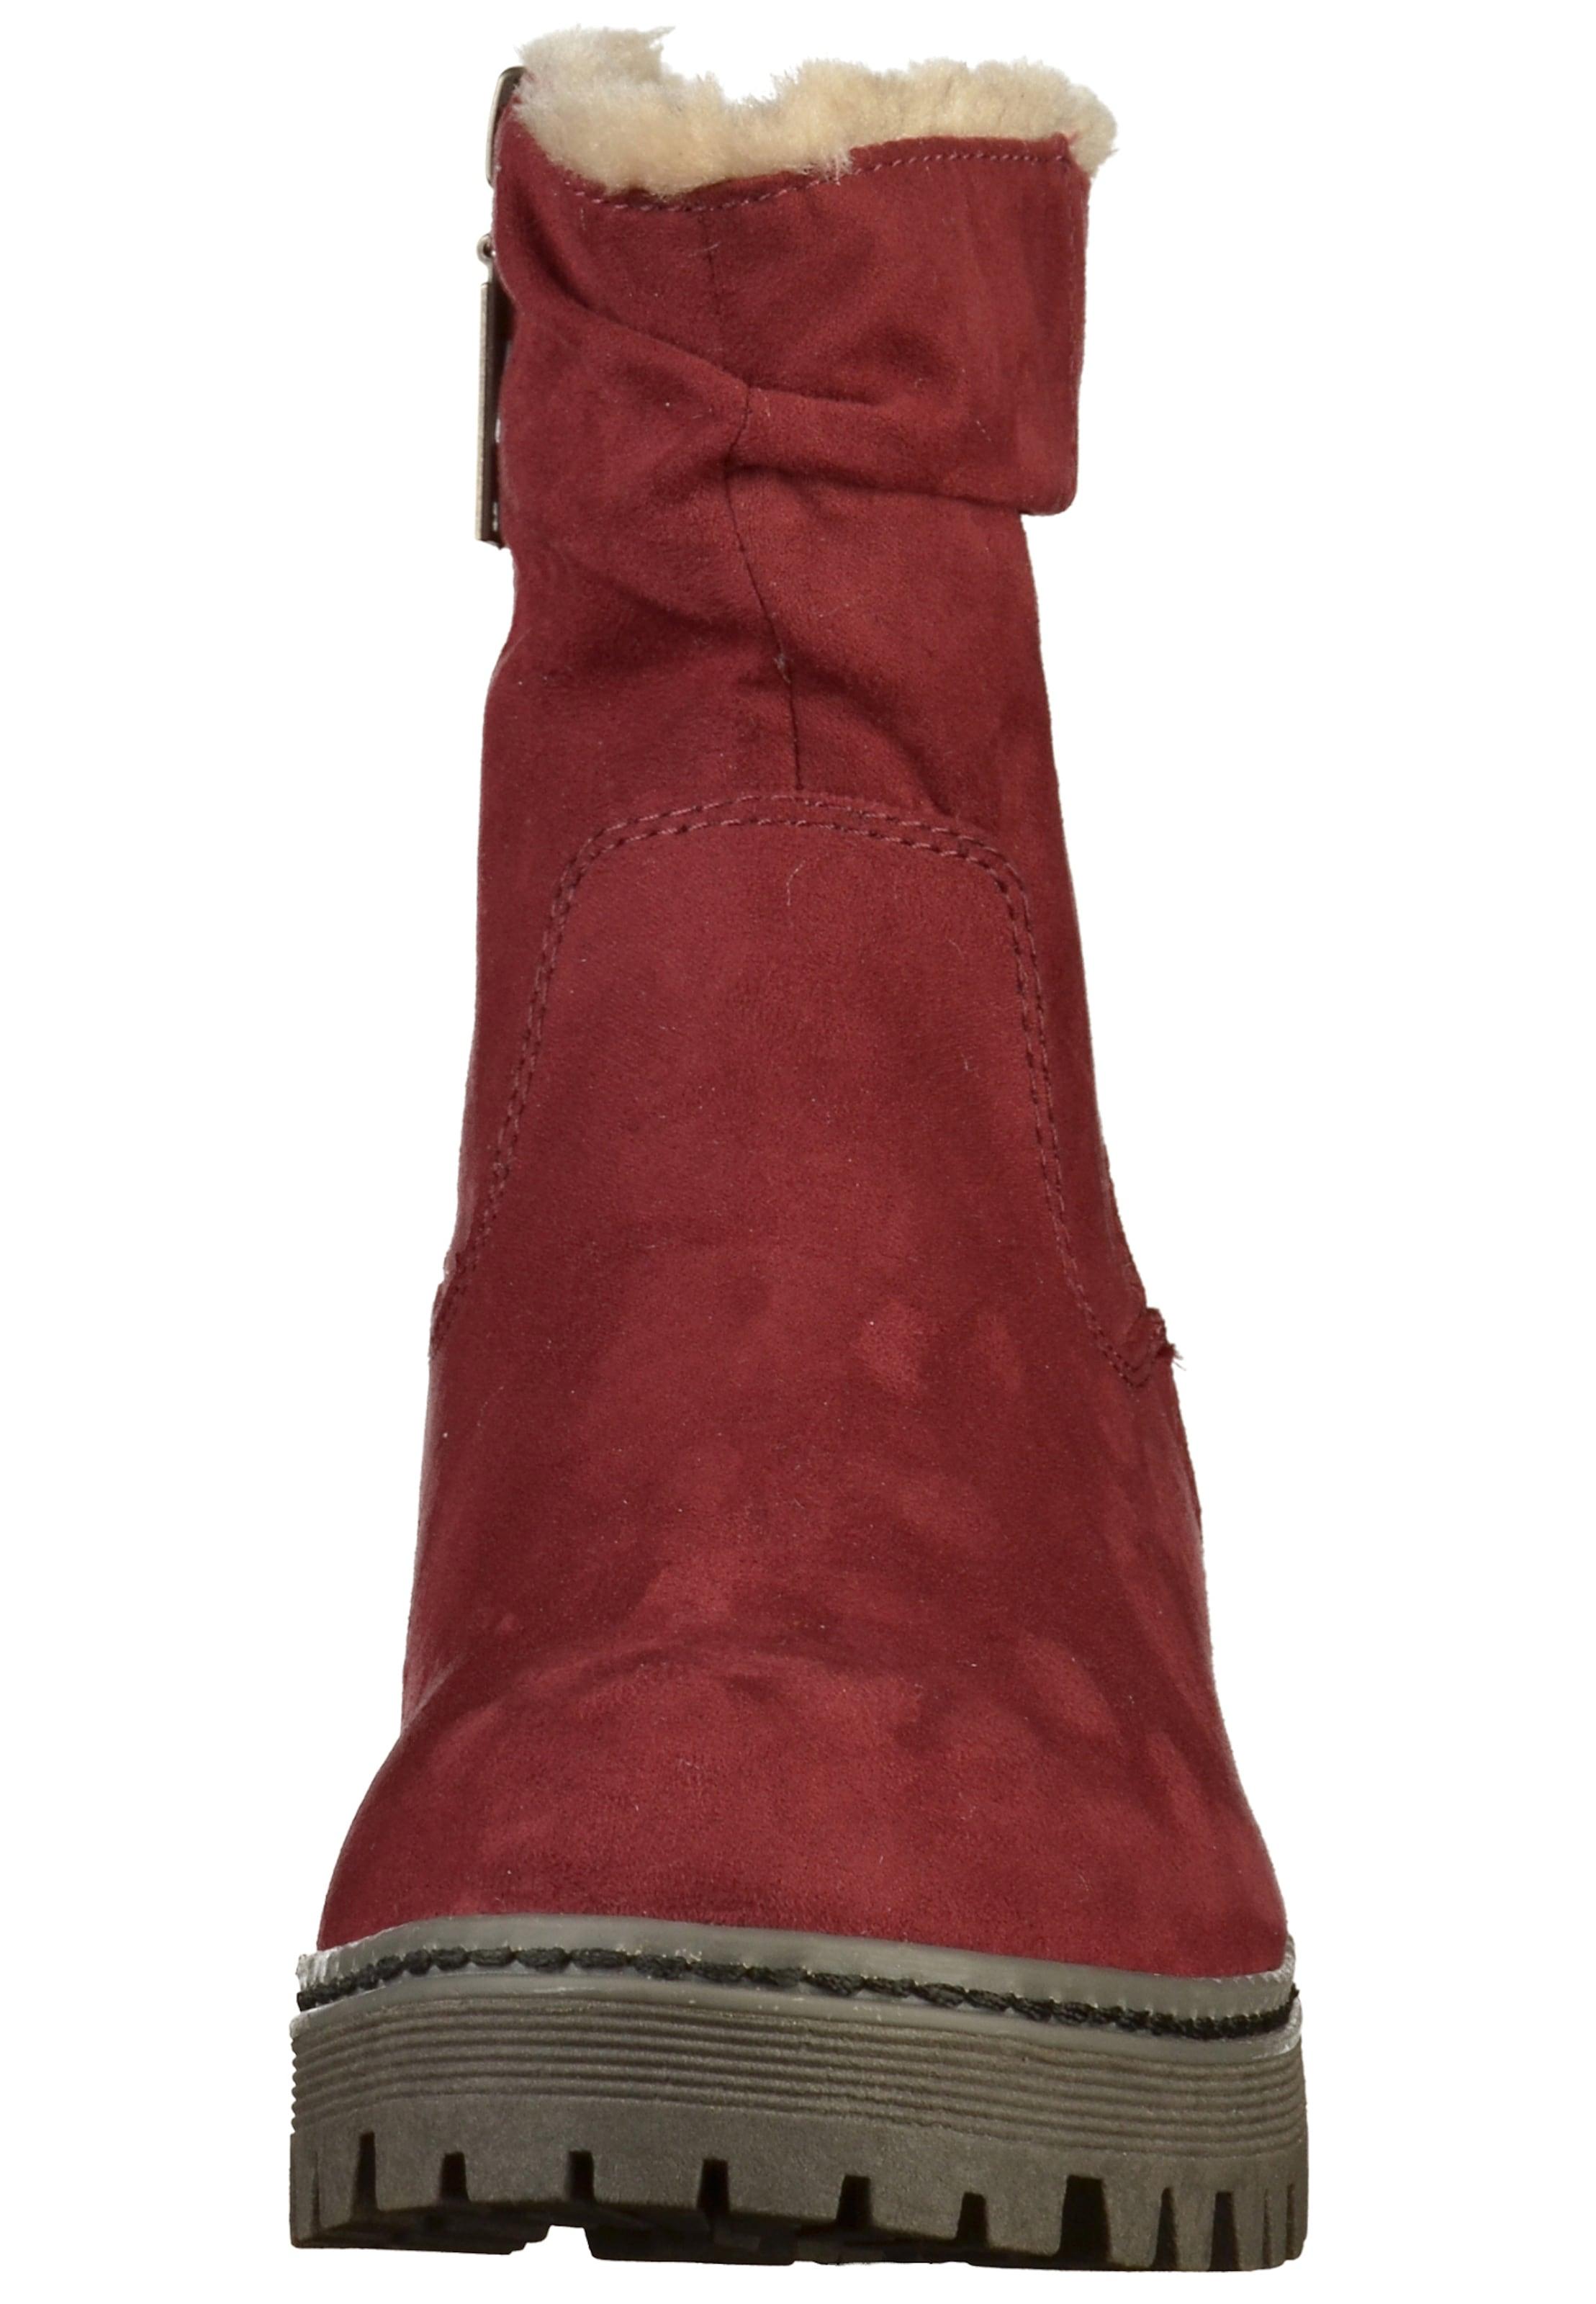 S Label ChinéGris oliver En Rouge Beige Bottines Red Basalte jMLzUpqSVG